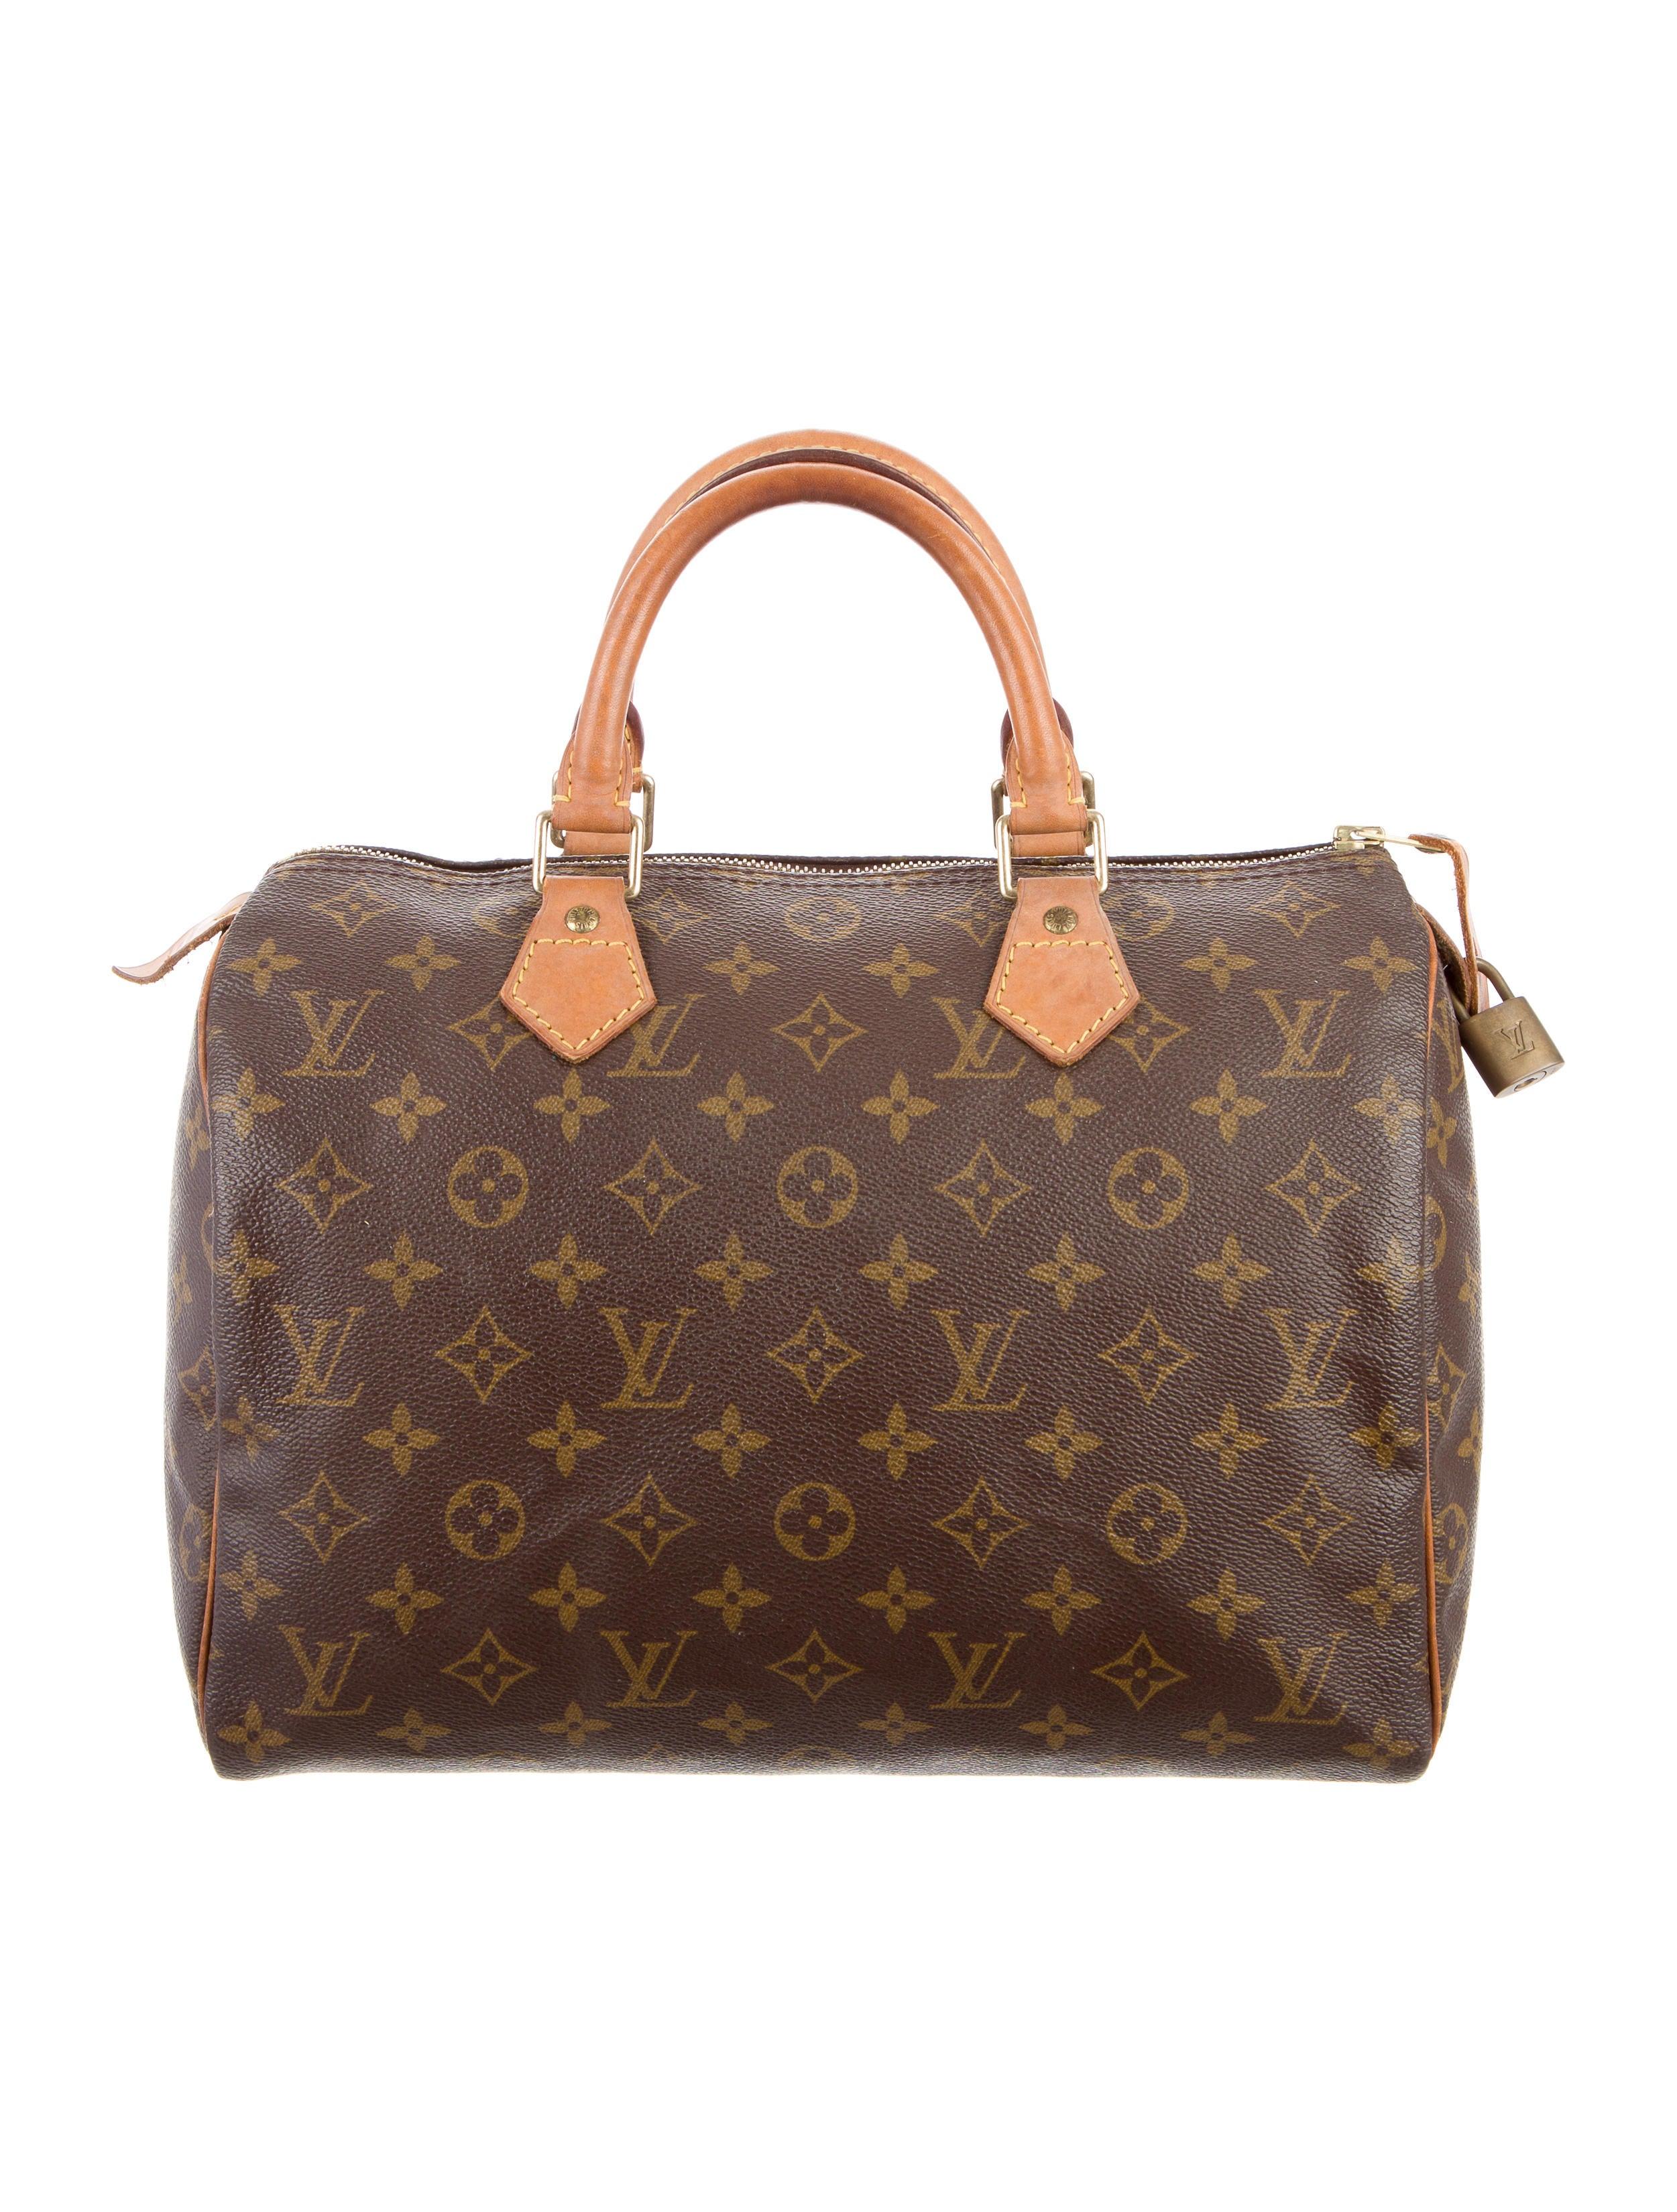 louis vuitton monogram speedy 30 handbags lou107152. Black Bedroom Furniture Sets. Home Design Ideas